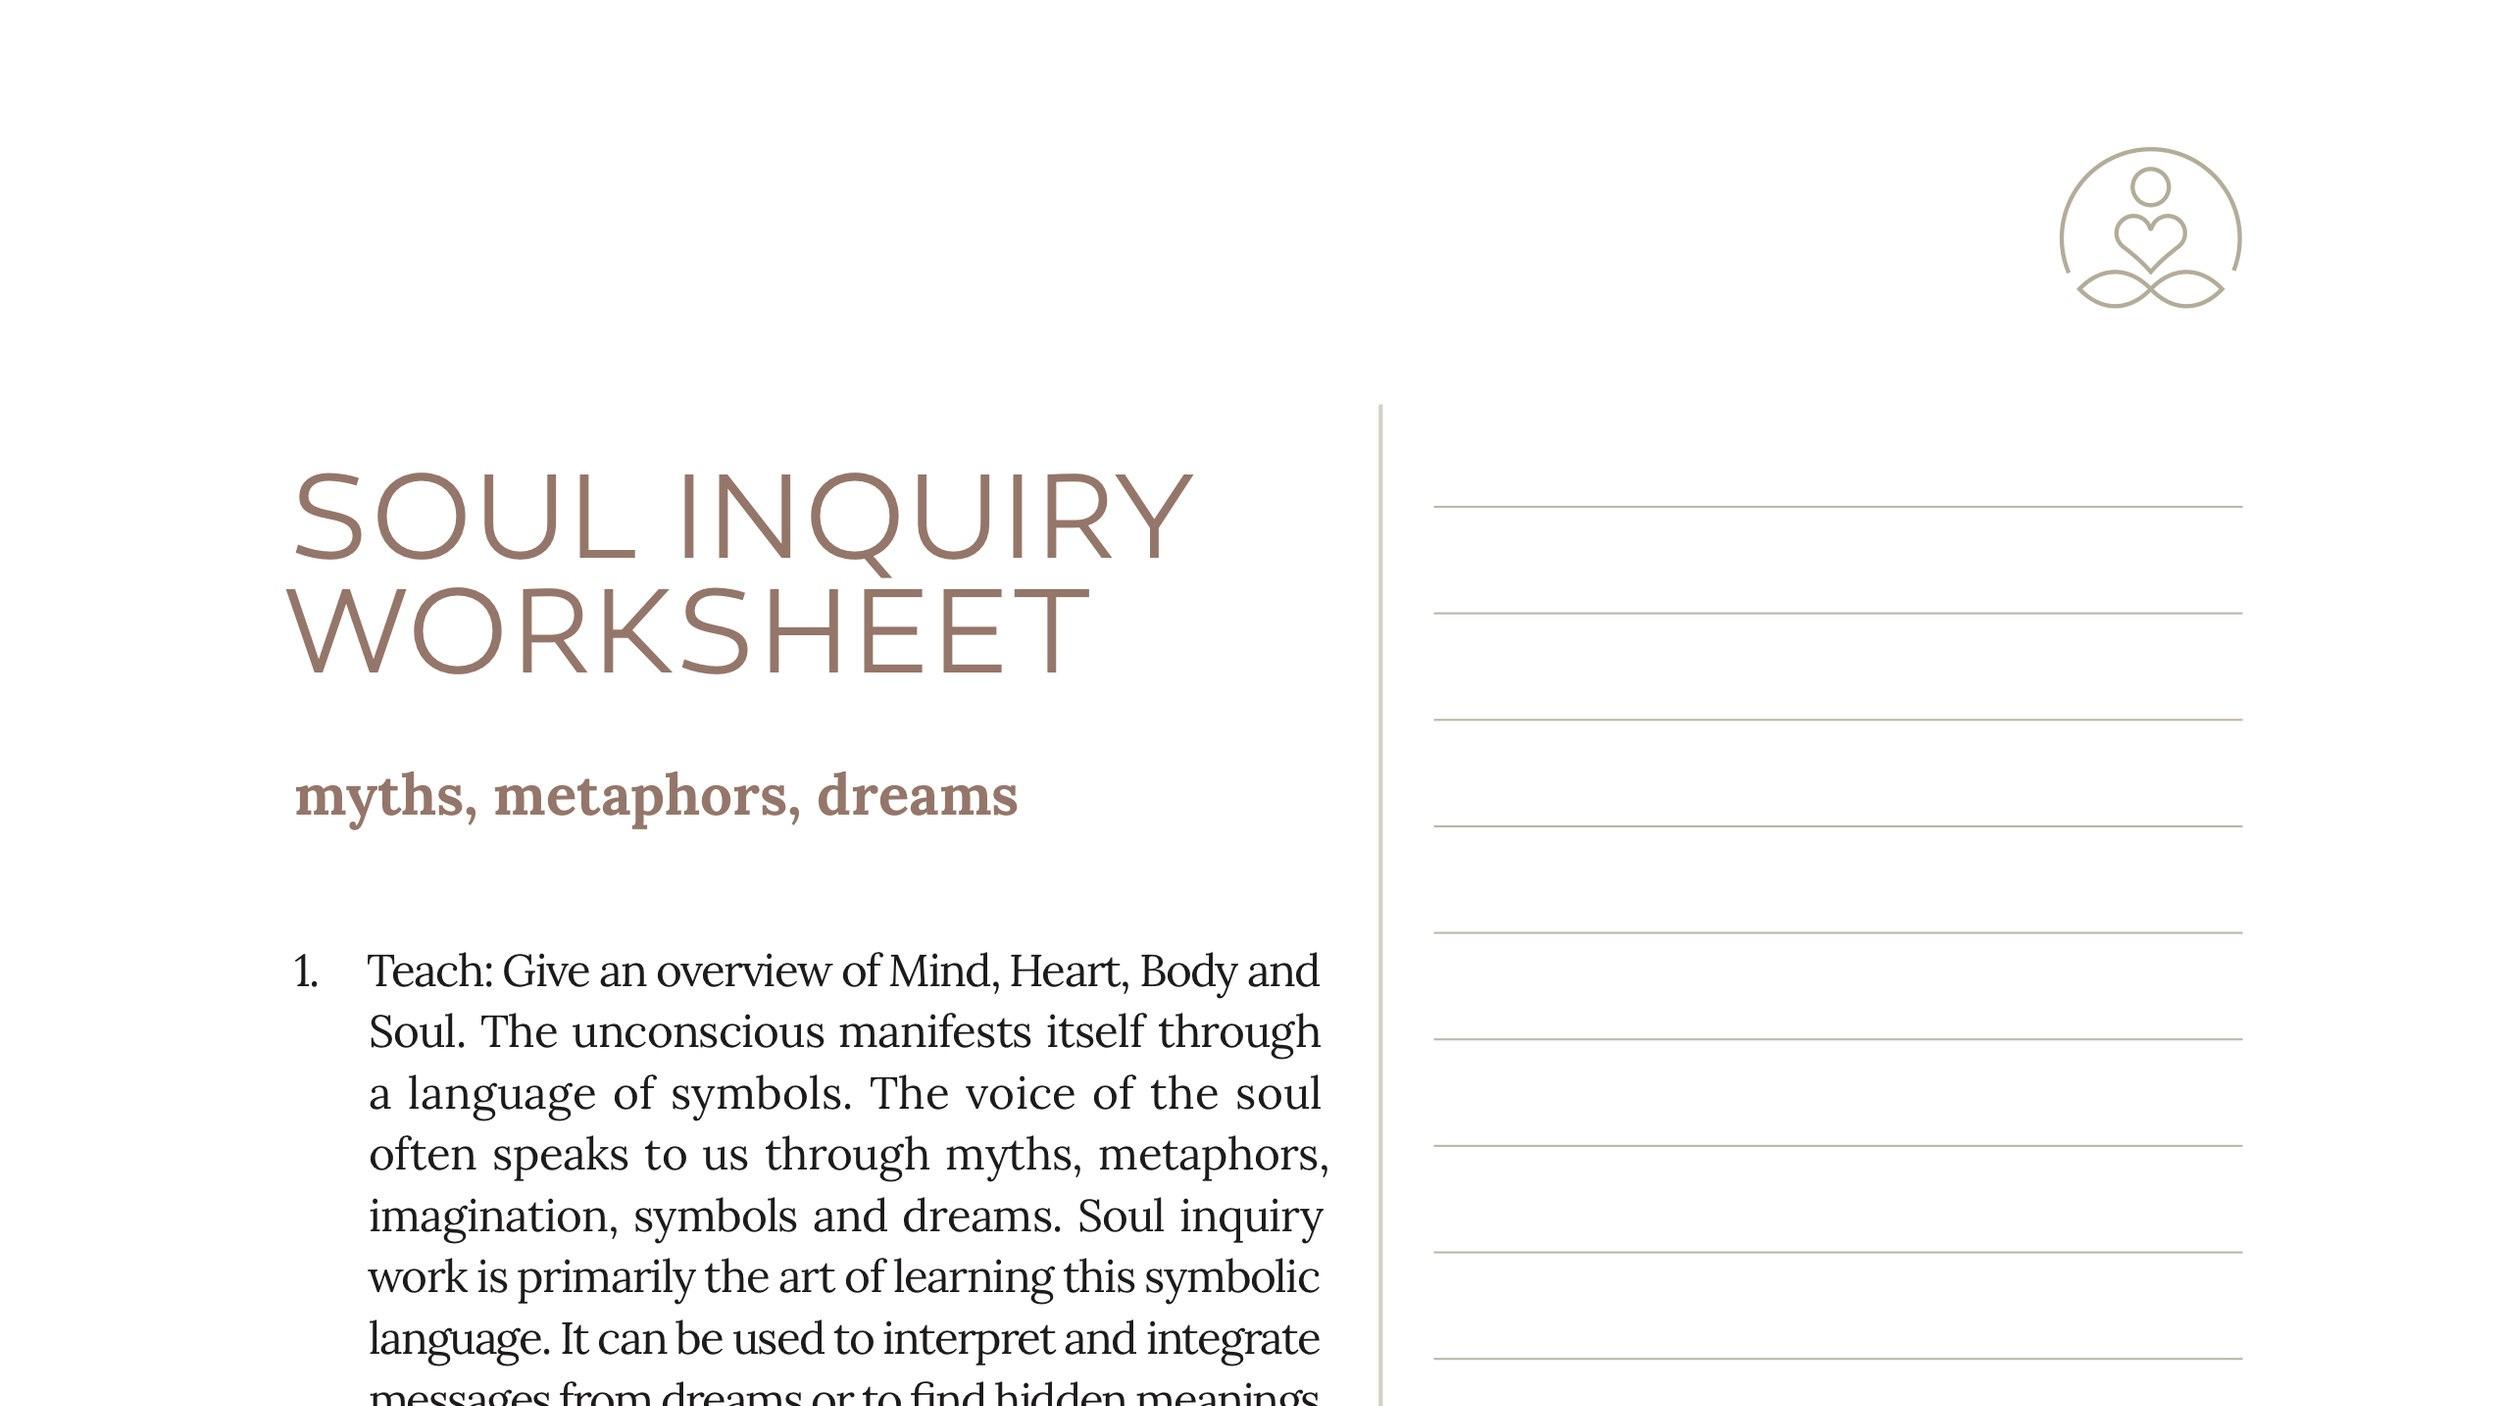 Soul+Inquiry+Worksheet.jpg